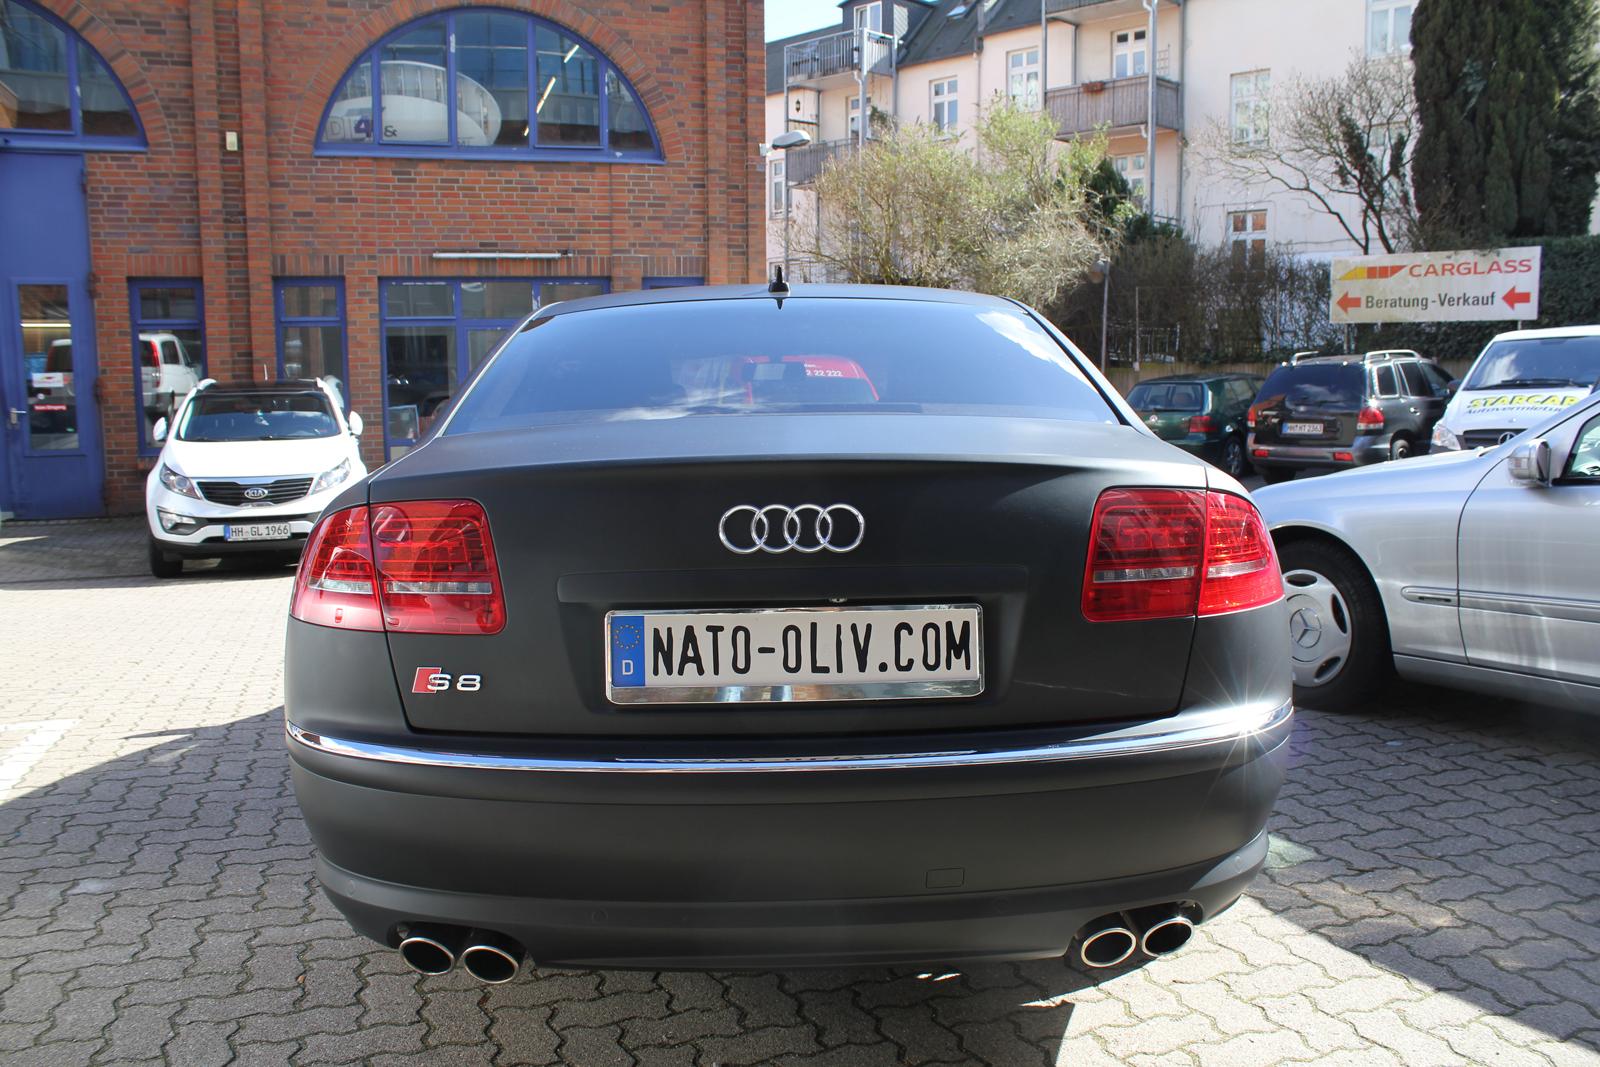 AUDI_S8_CAR-WRAPPING_SCHWARZ_MATT_01